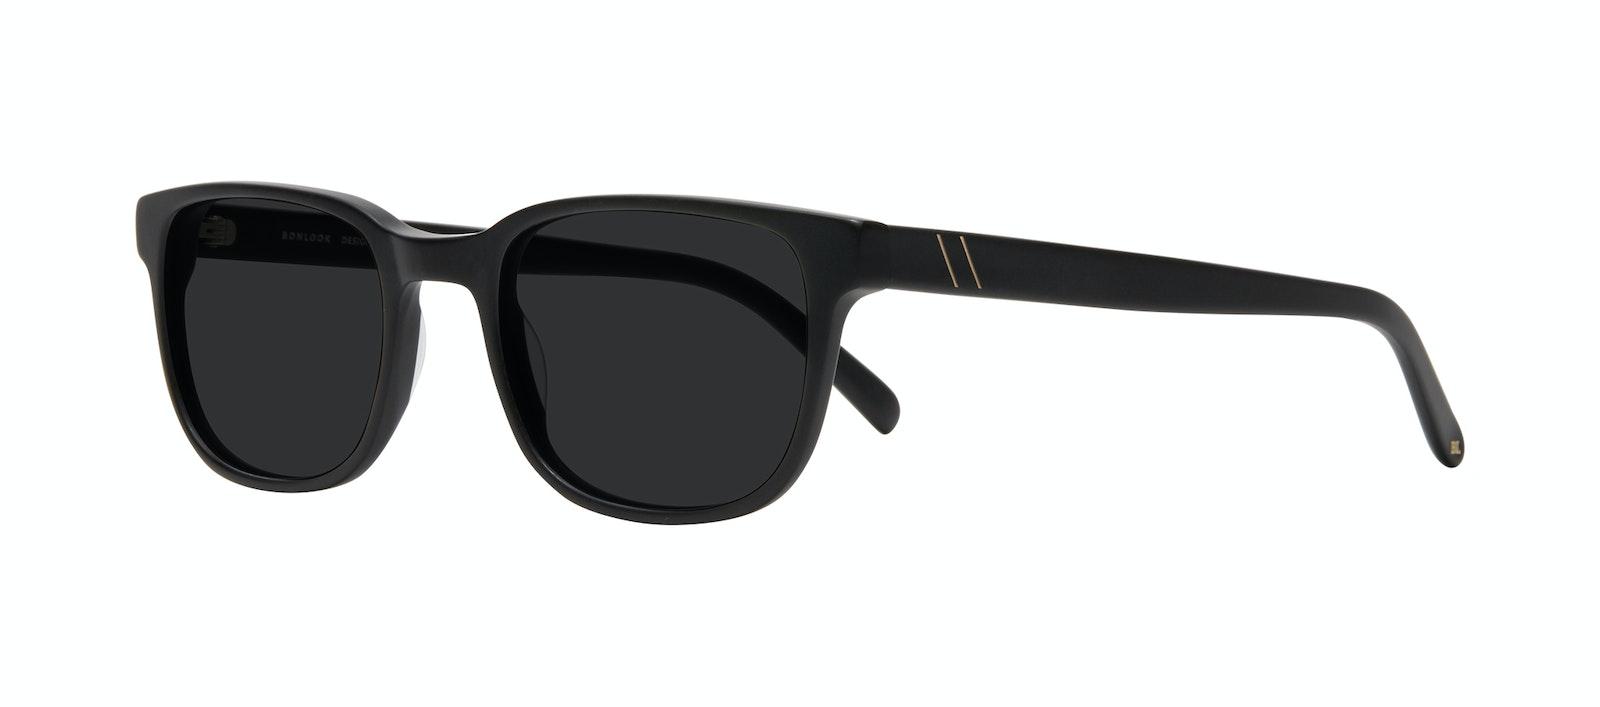 Affordable Fashion Glasses Square Sunglasses Men Role Black Matte Tilt